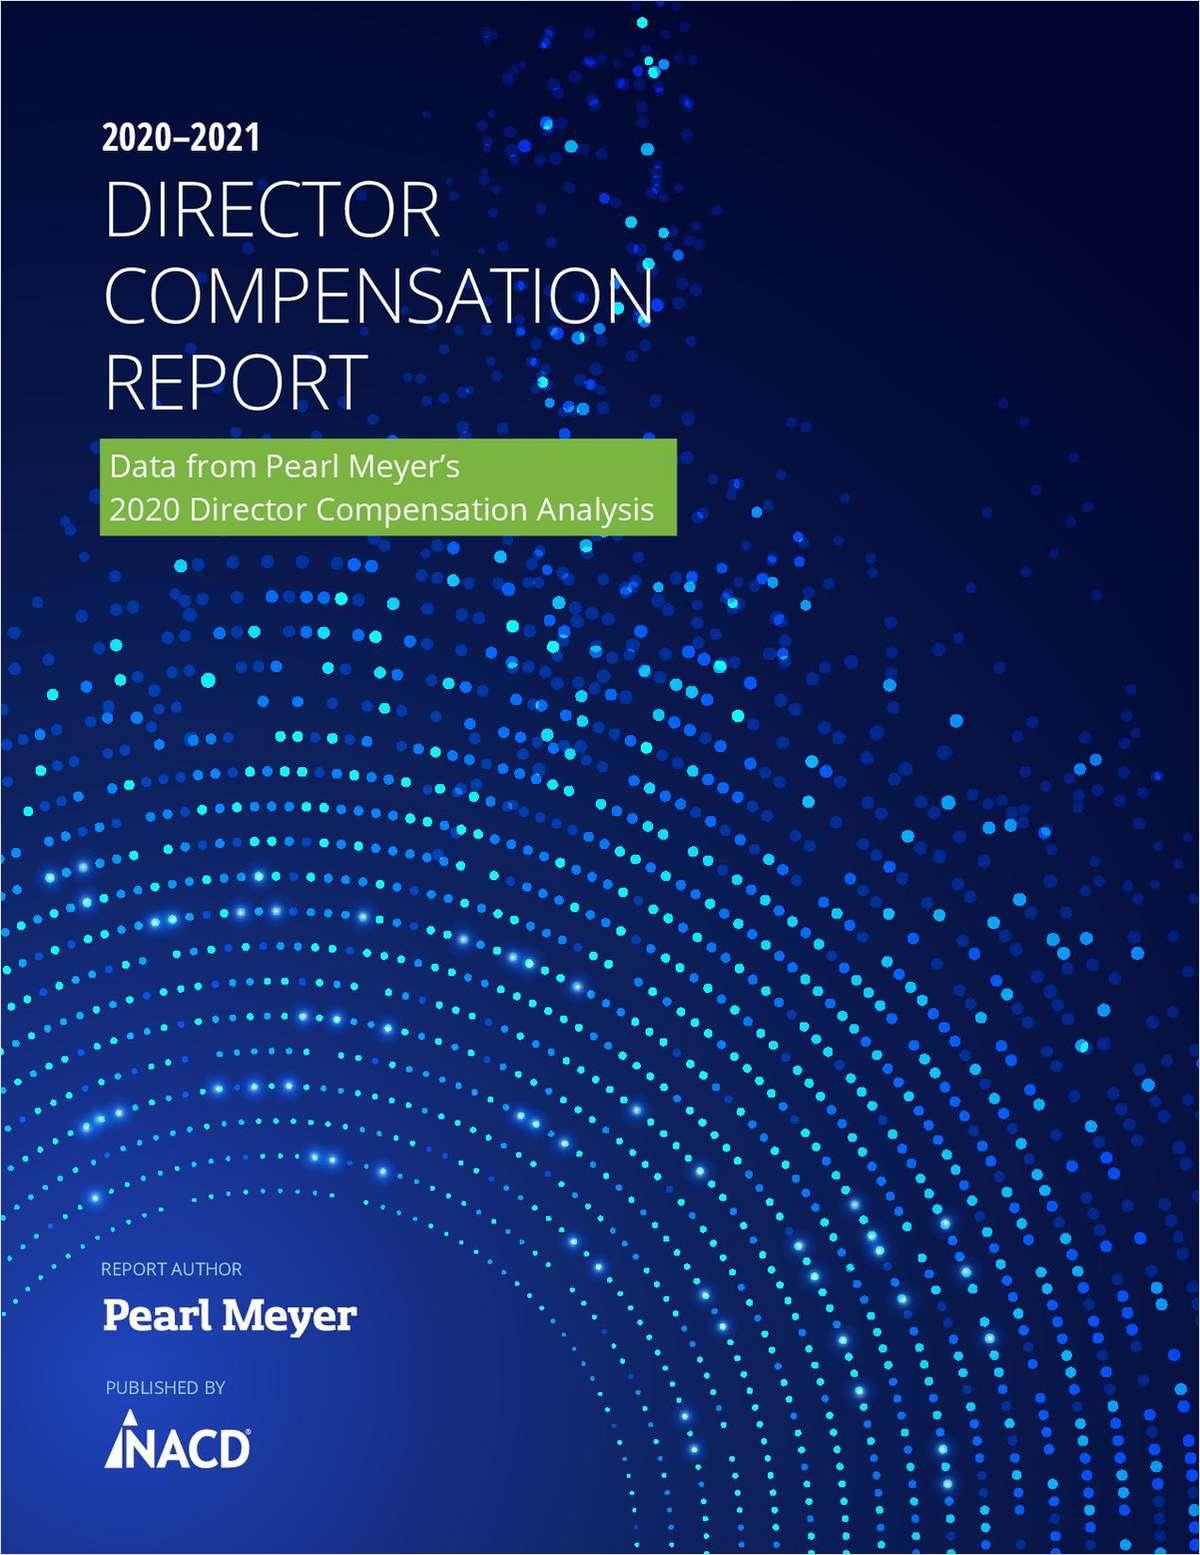 2020-2021 Director Compensation Report